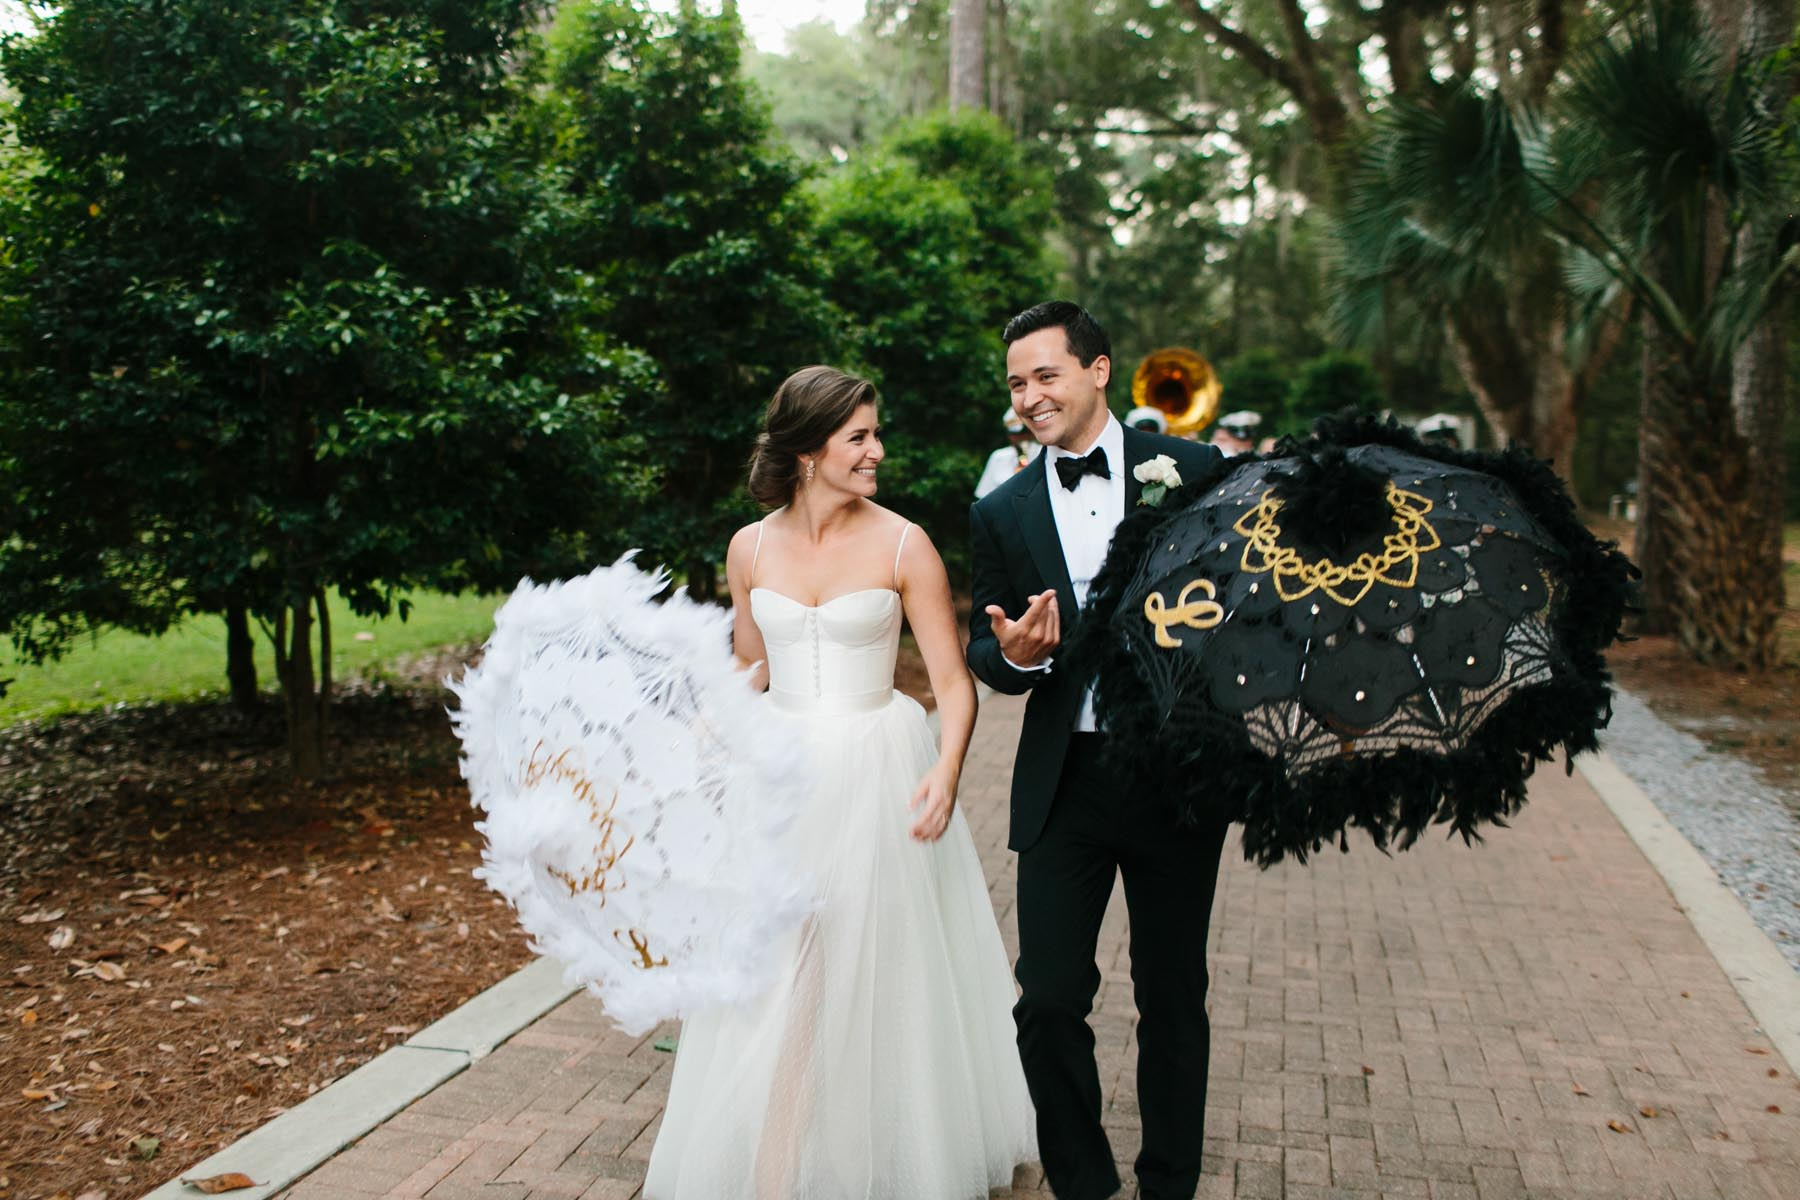 lowry wedding blog eden garden florida wedding-121